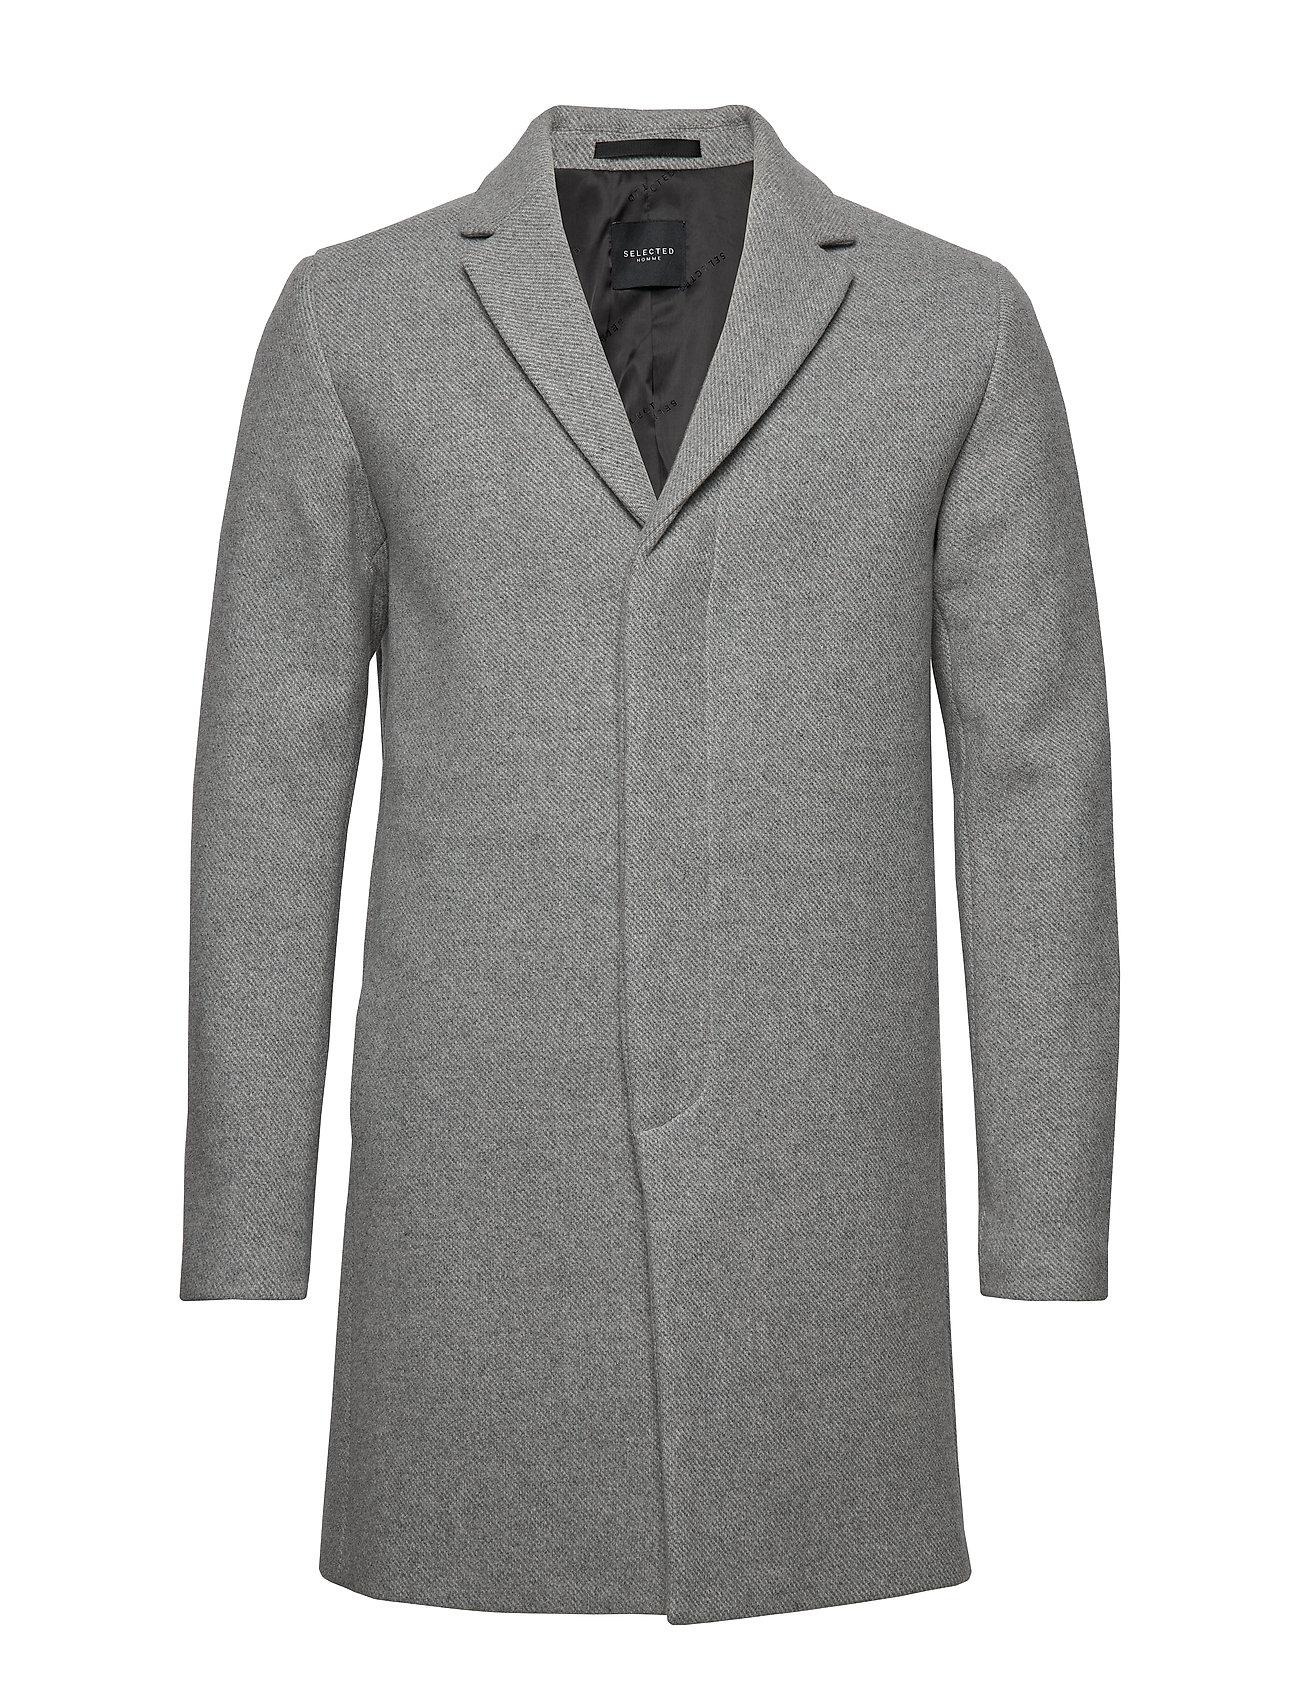 SELECTED Slhbrove Wool Coat B Wollmantel Mantel Grau SELECTED HOMME